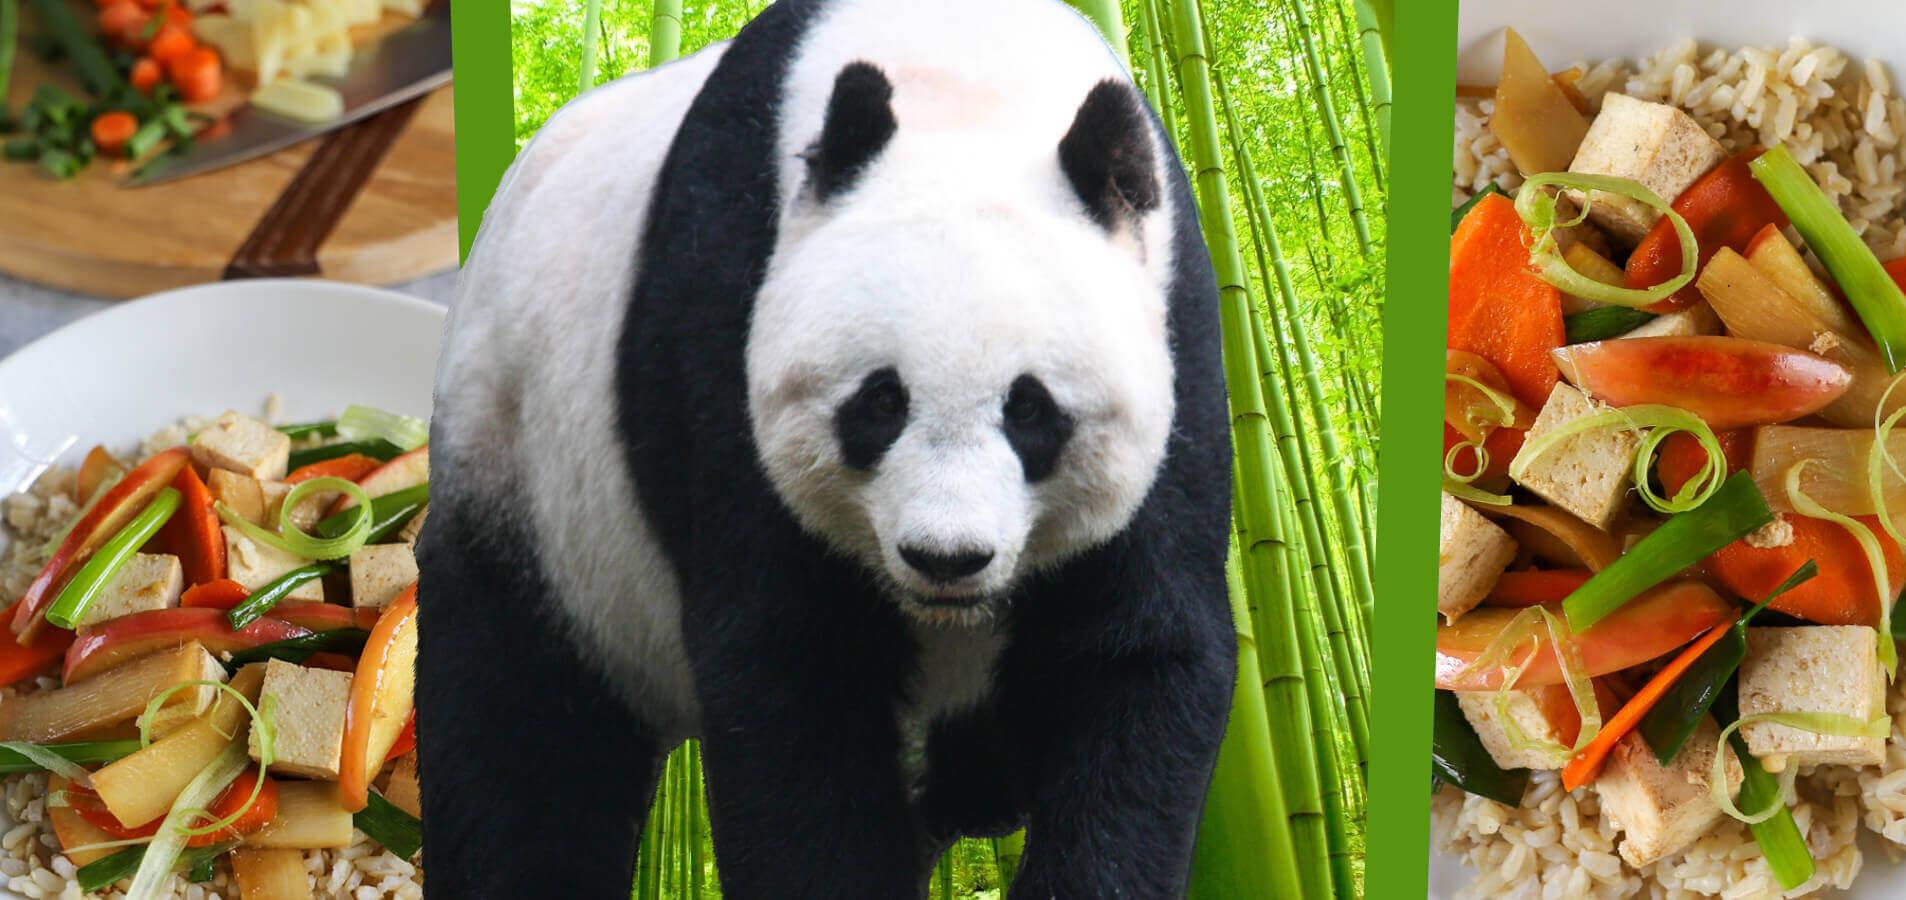 Eat Like a Giant Panda: Apple and Bamboo Stir Fry